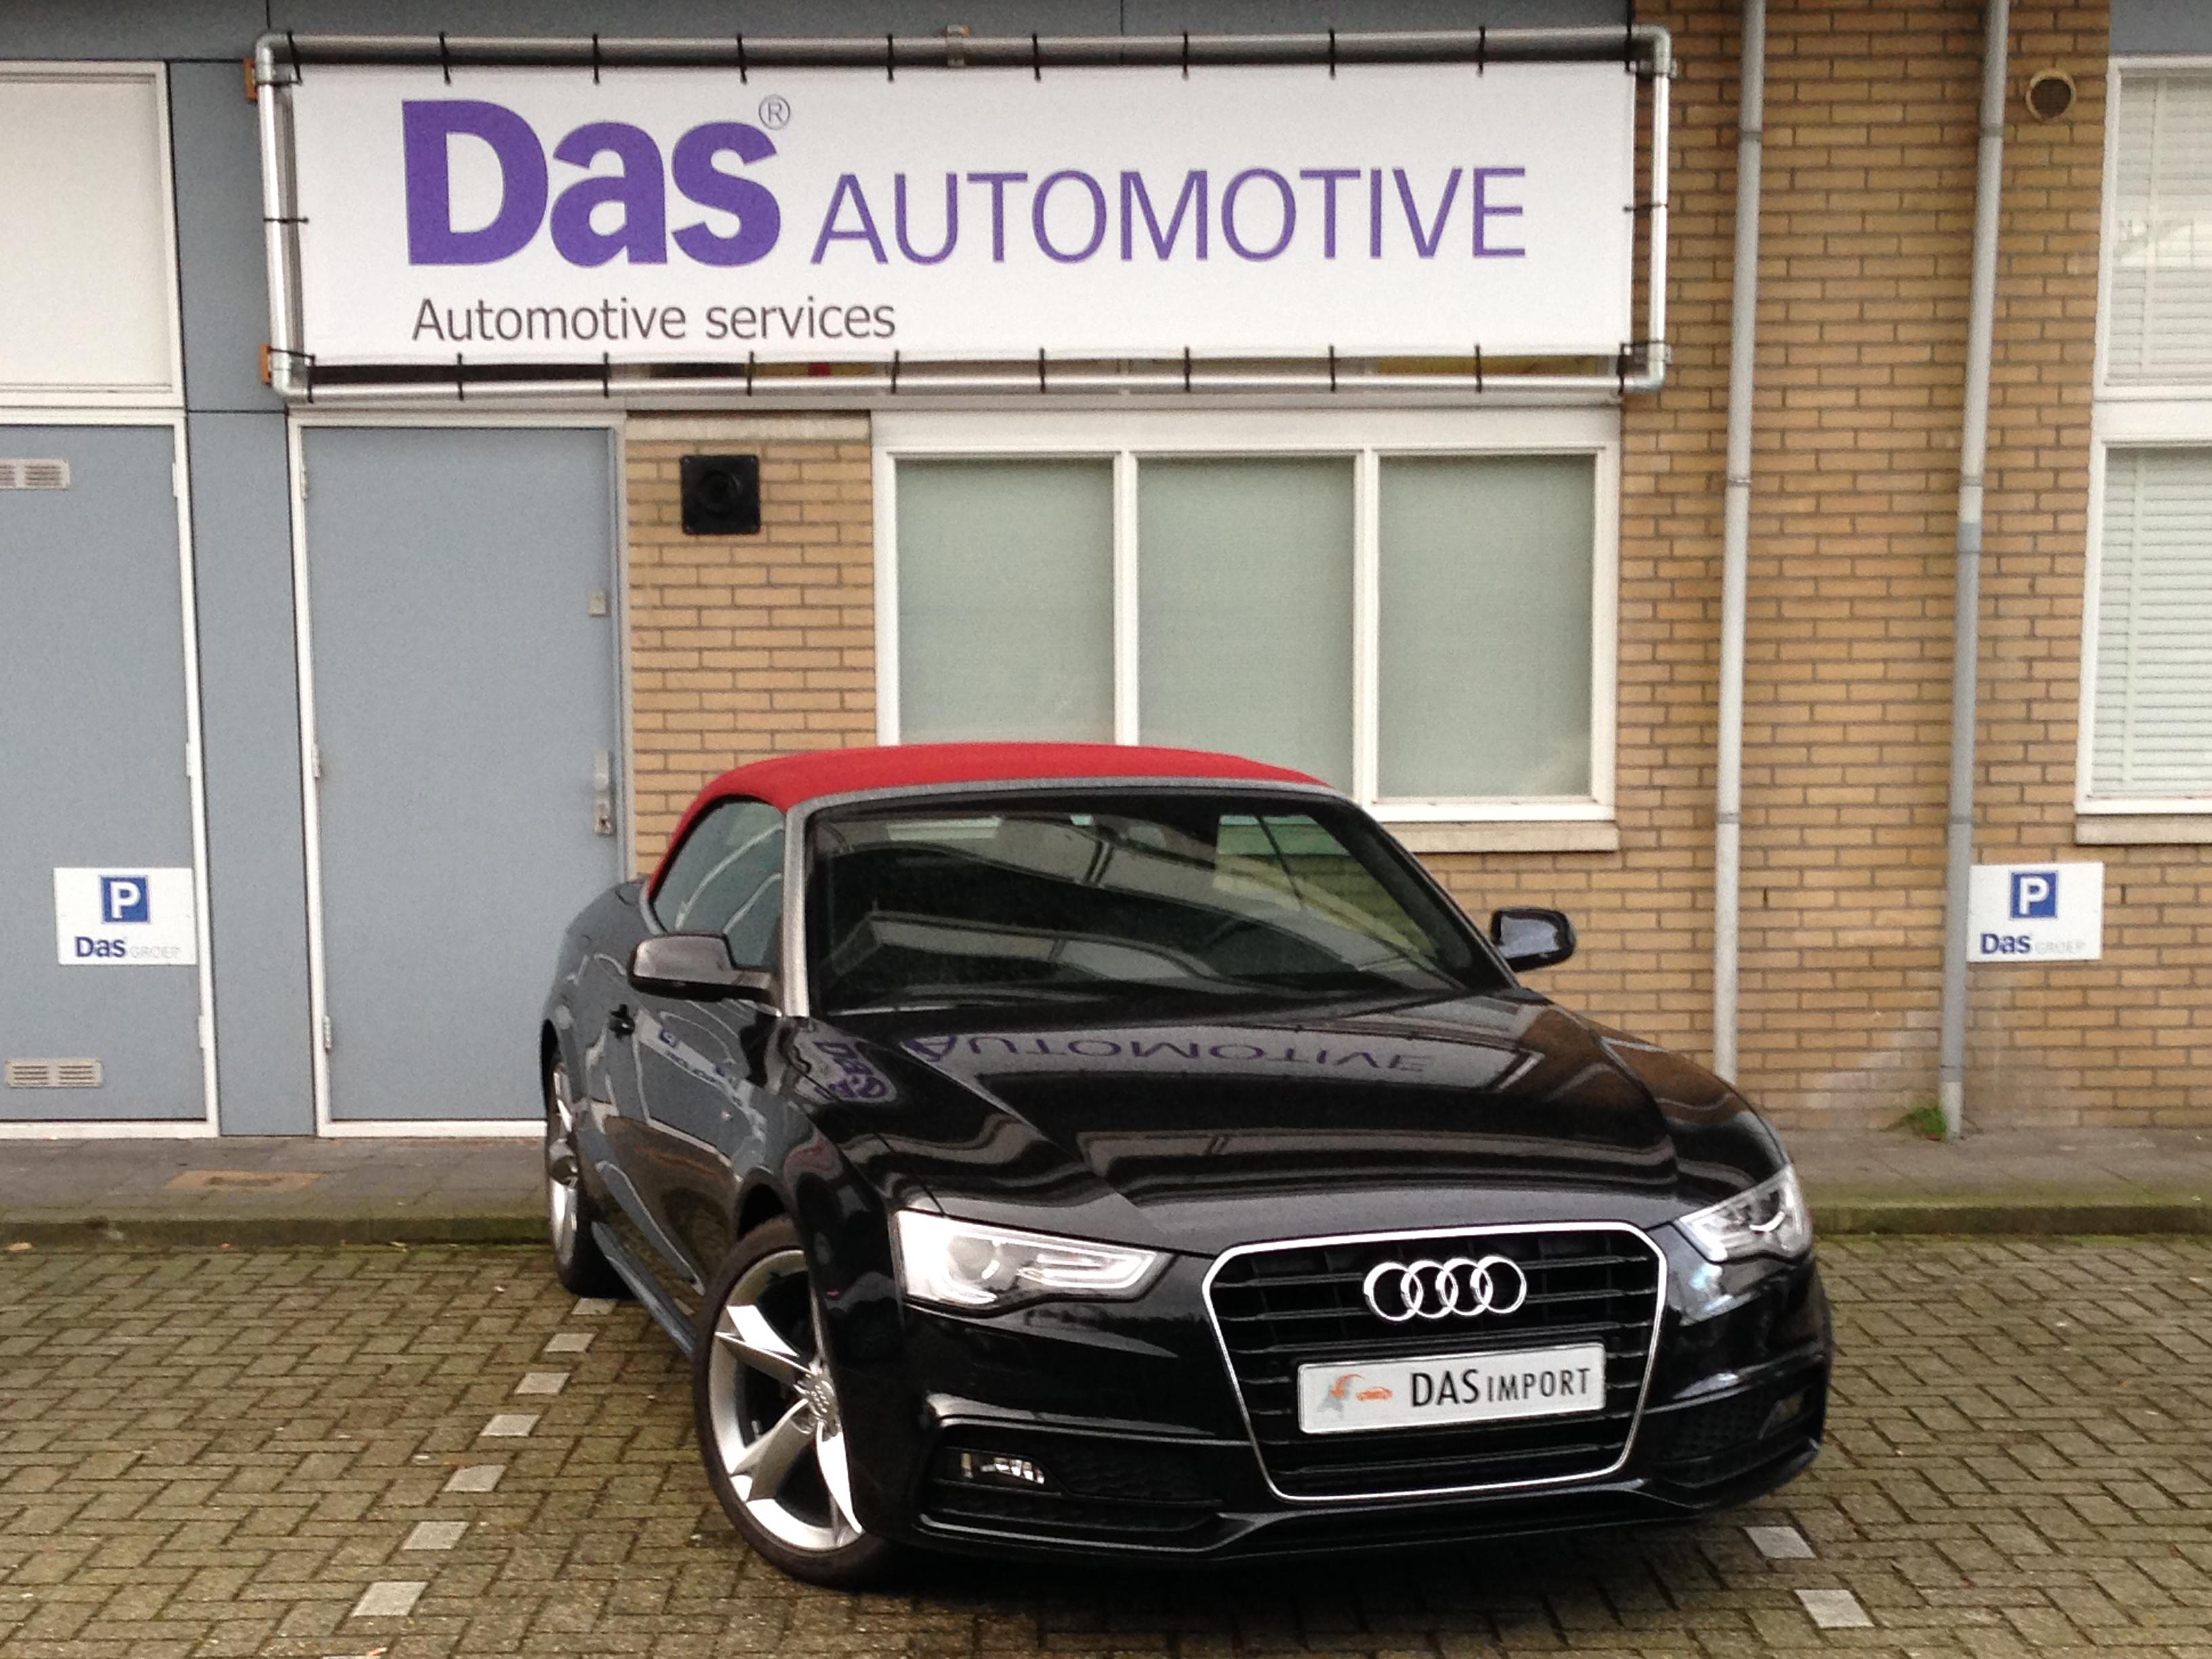 Importauto: Audi A5 Cabriolet 1.8 TFSI 125kW multitronic 5/2013